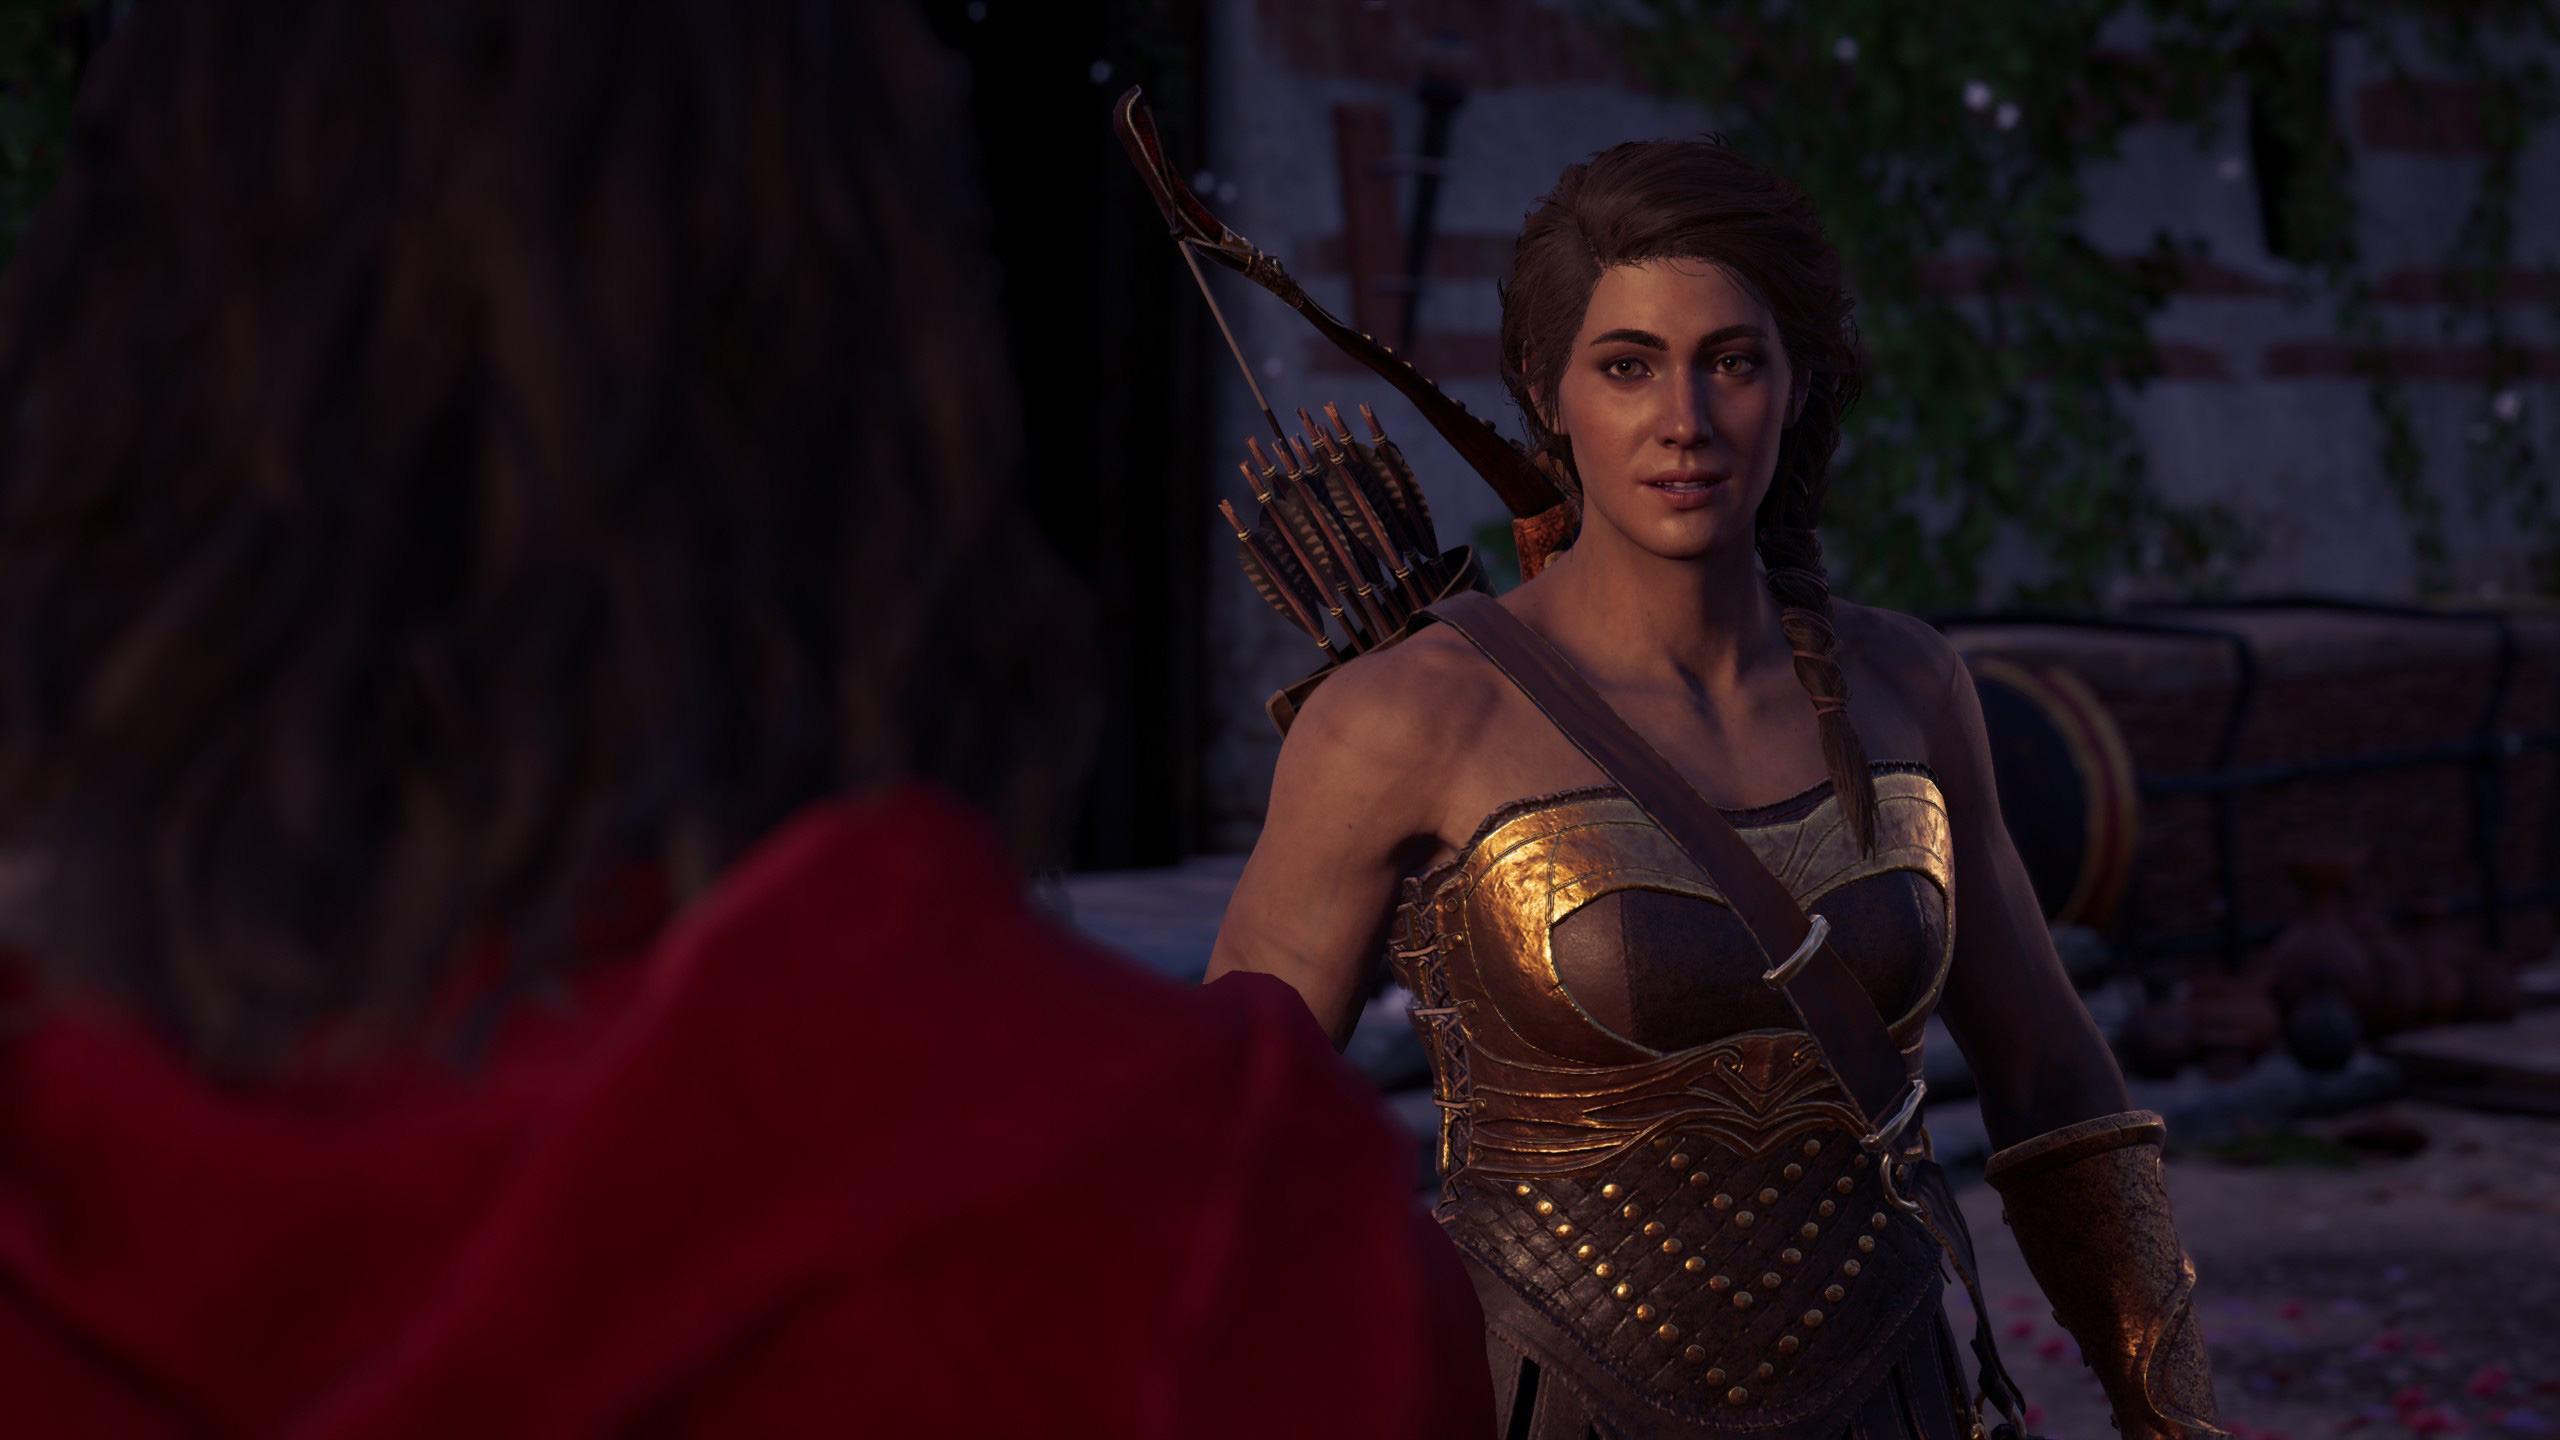 Assassin's-Creed®-Odyssey2020-3-22-1-25-46.jpg